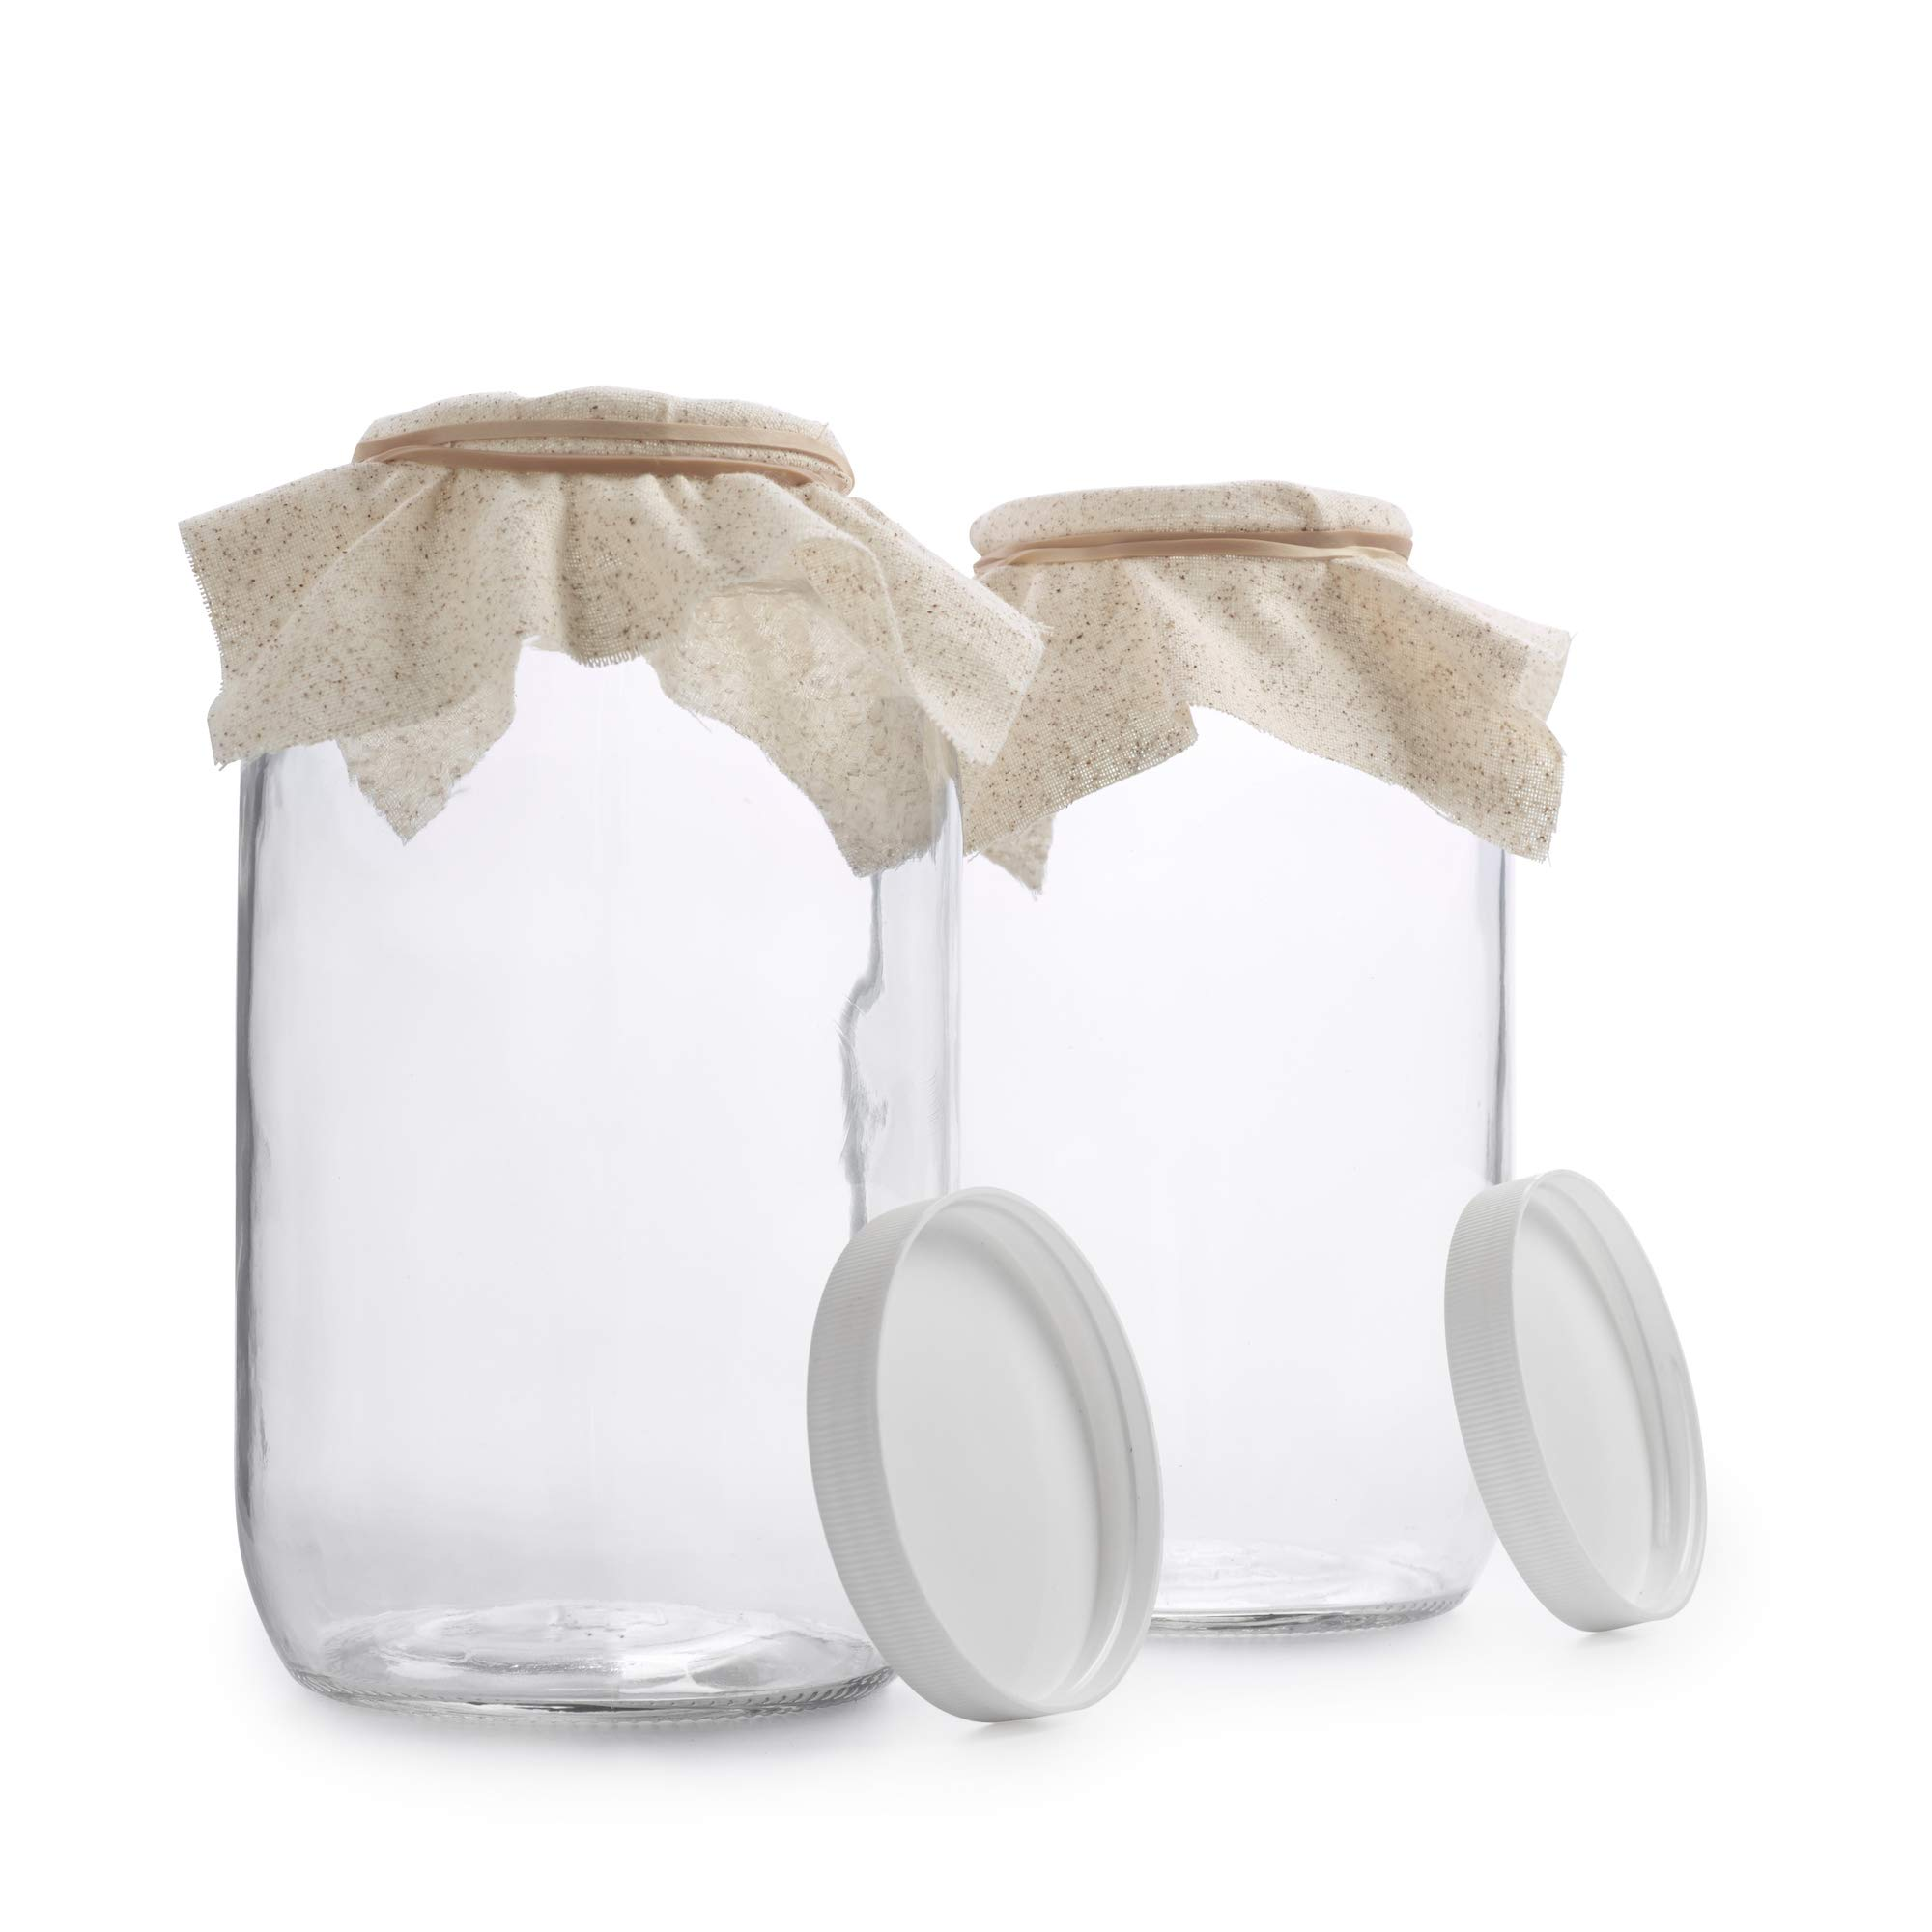 1790 Half Gallon Glass Jars (64oz) 2-Pack - Includes 2 Airtight Lids, Muslin Cloths, Rubber Bands - BPA Free, Dishwasher & Freezer Safe - Perfect for Kombucha, Kefir, Canning, Sun Tea, Fermentation by 1790 (Image #2)